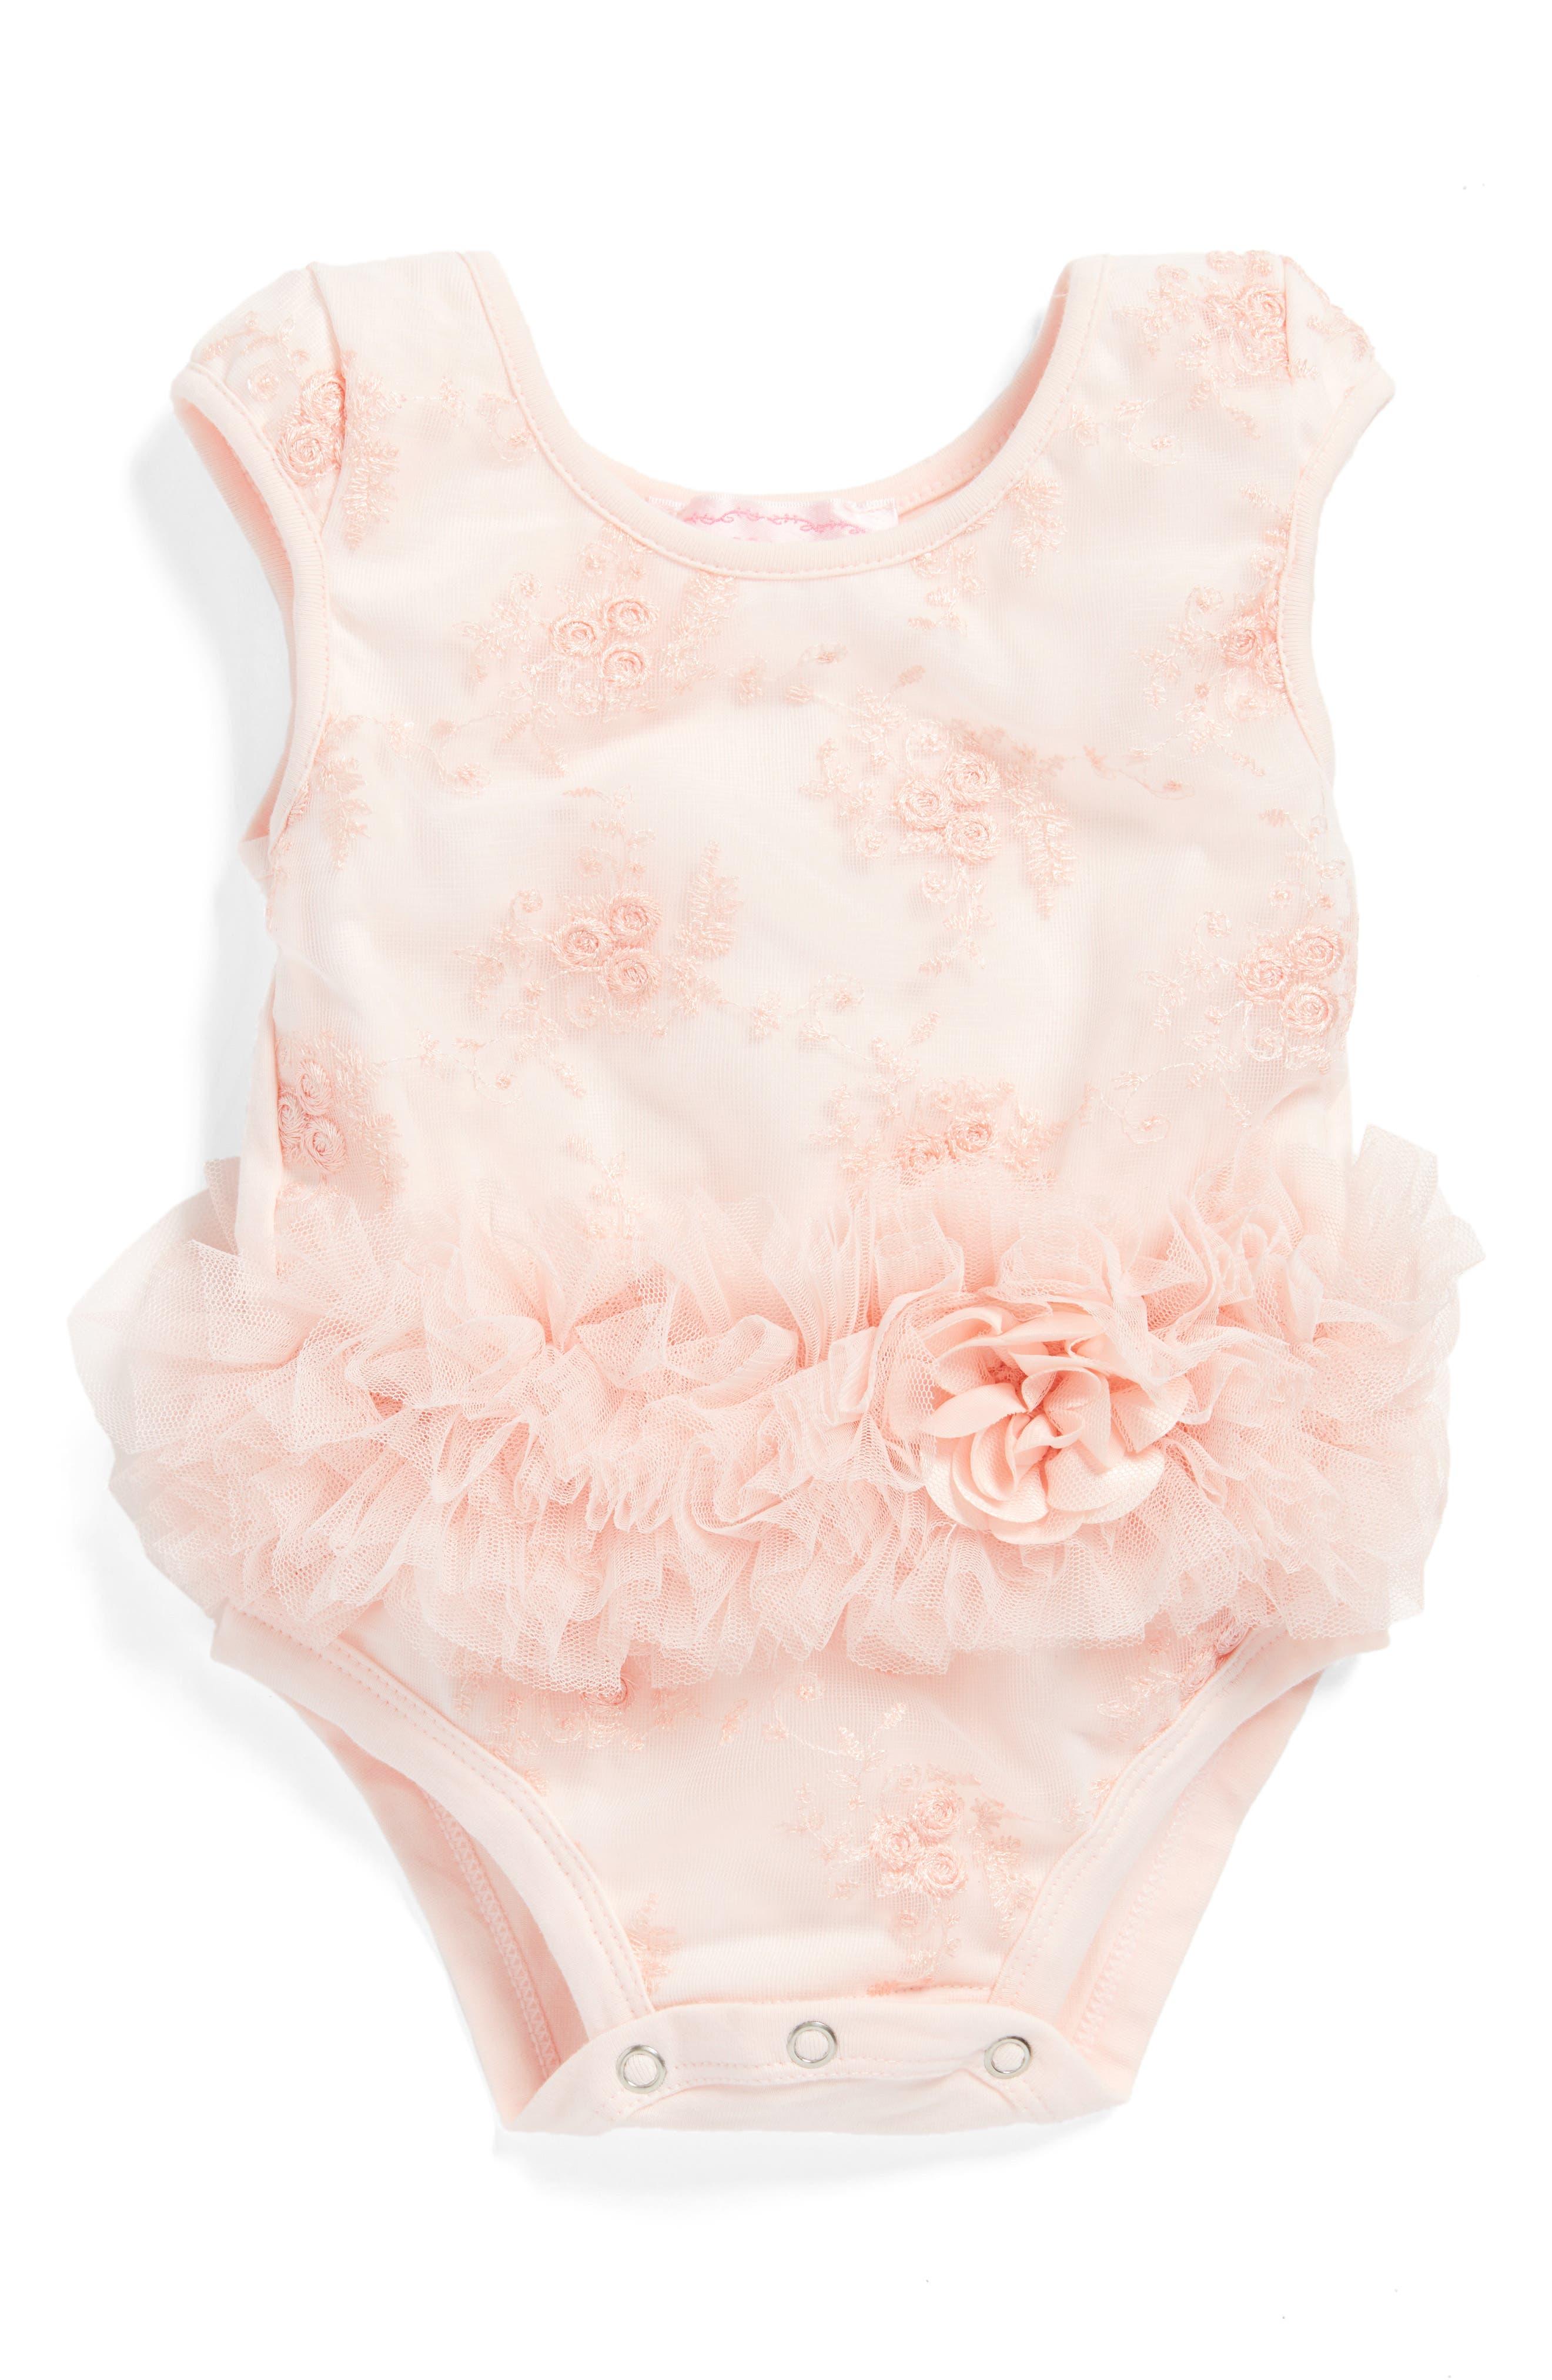 Alternate Image 1 Selected - Popatu Peach Flower Tutu Bodysuit (Baby Girls)